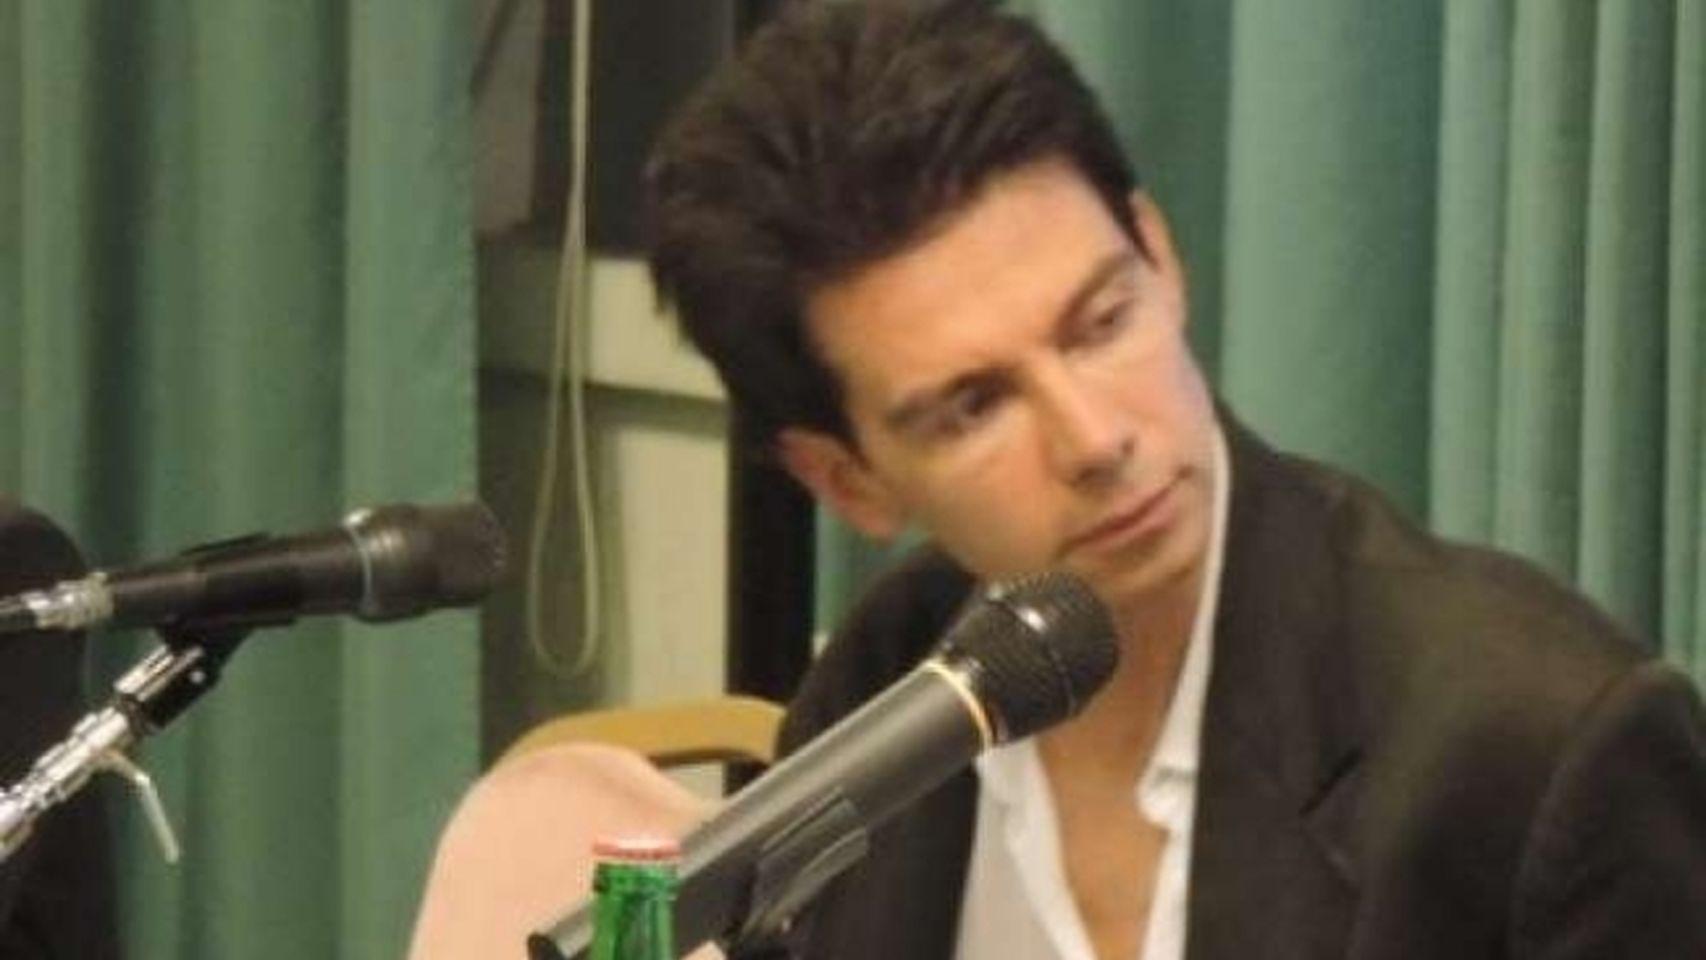 Destituyen a un magistrado italiano que obligaba a sus becarias a vestir minifalda